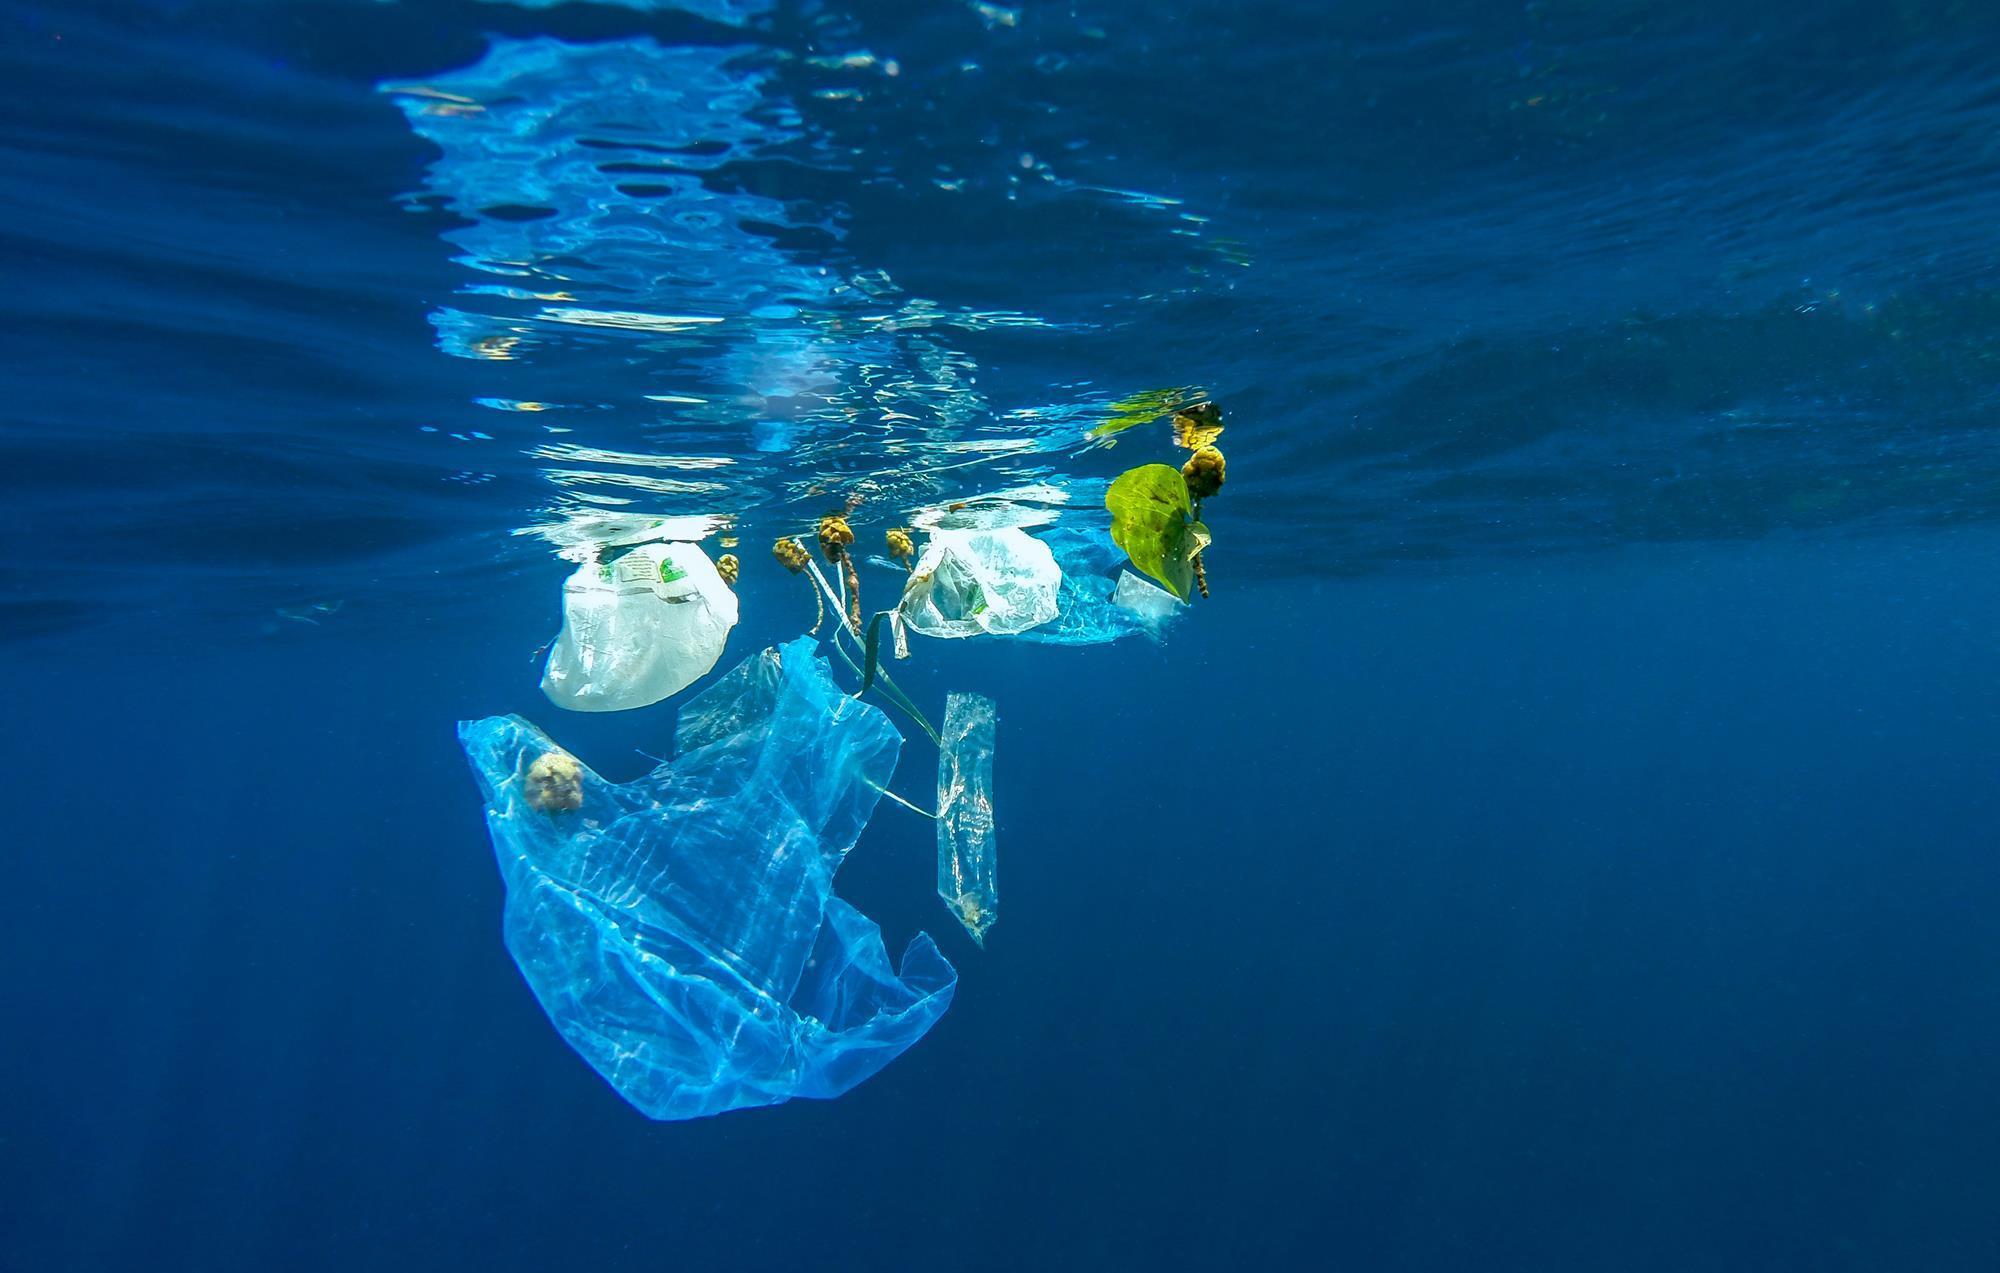 113812_microplastics-marine-pollution-1.jpg